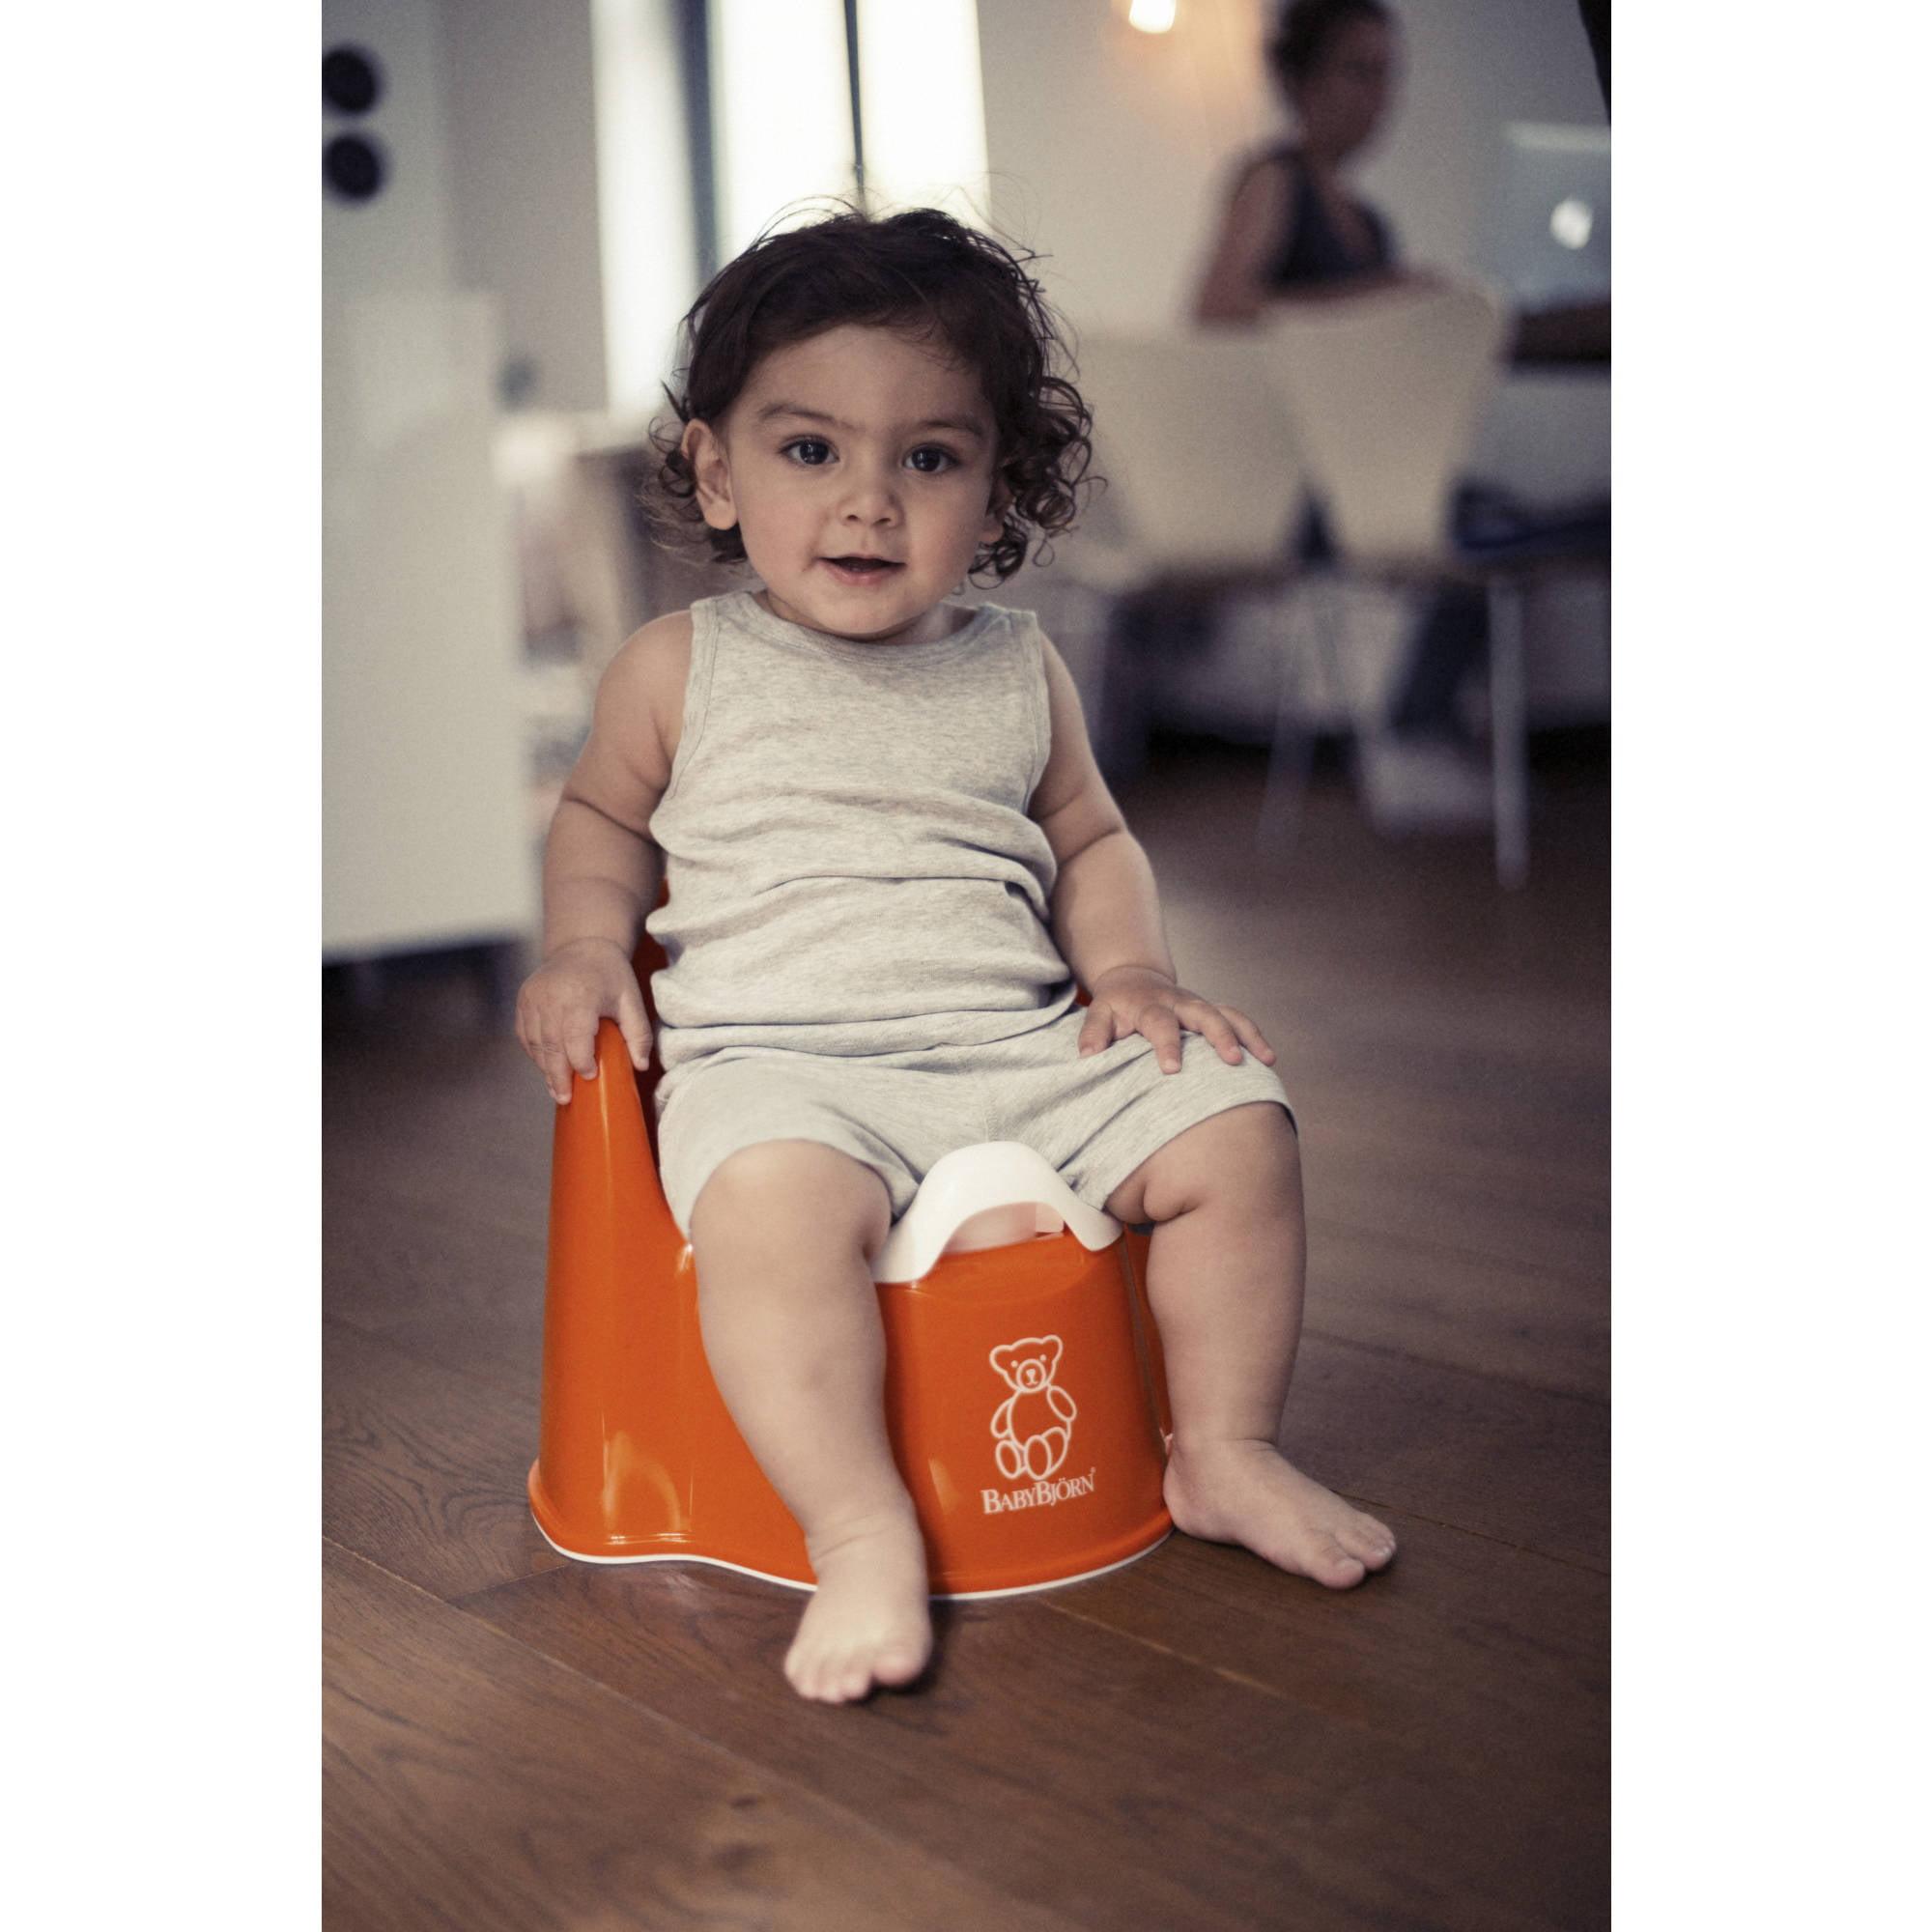 f5055eae530 BabyBjorn Potty Chair - Walmart.com